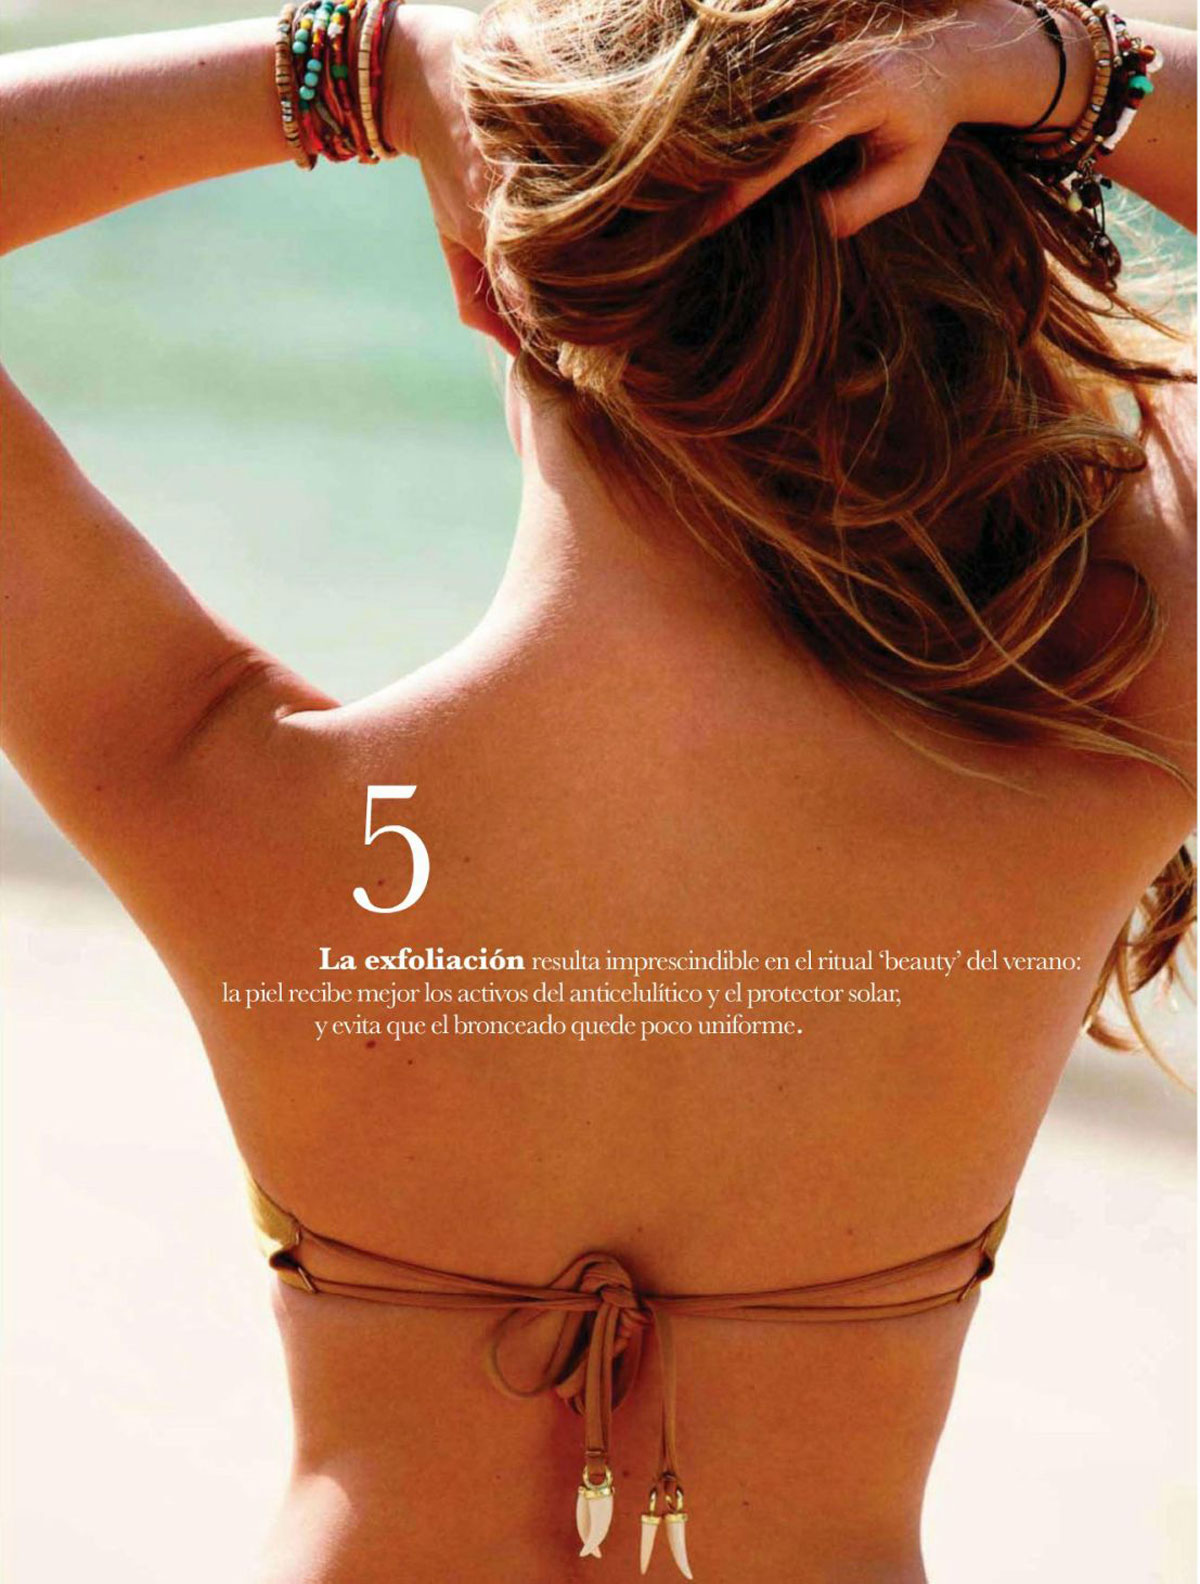 Bar Refaeli - Elle Magazine (Spain) March 2015 Issue